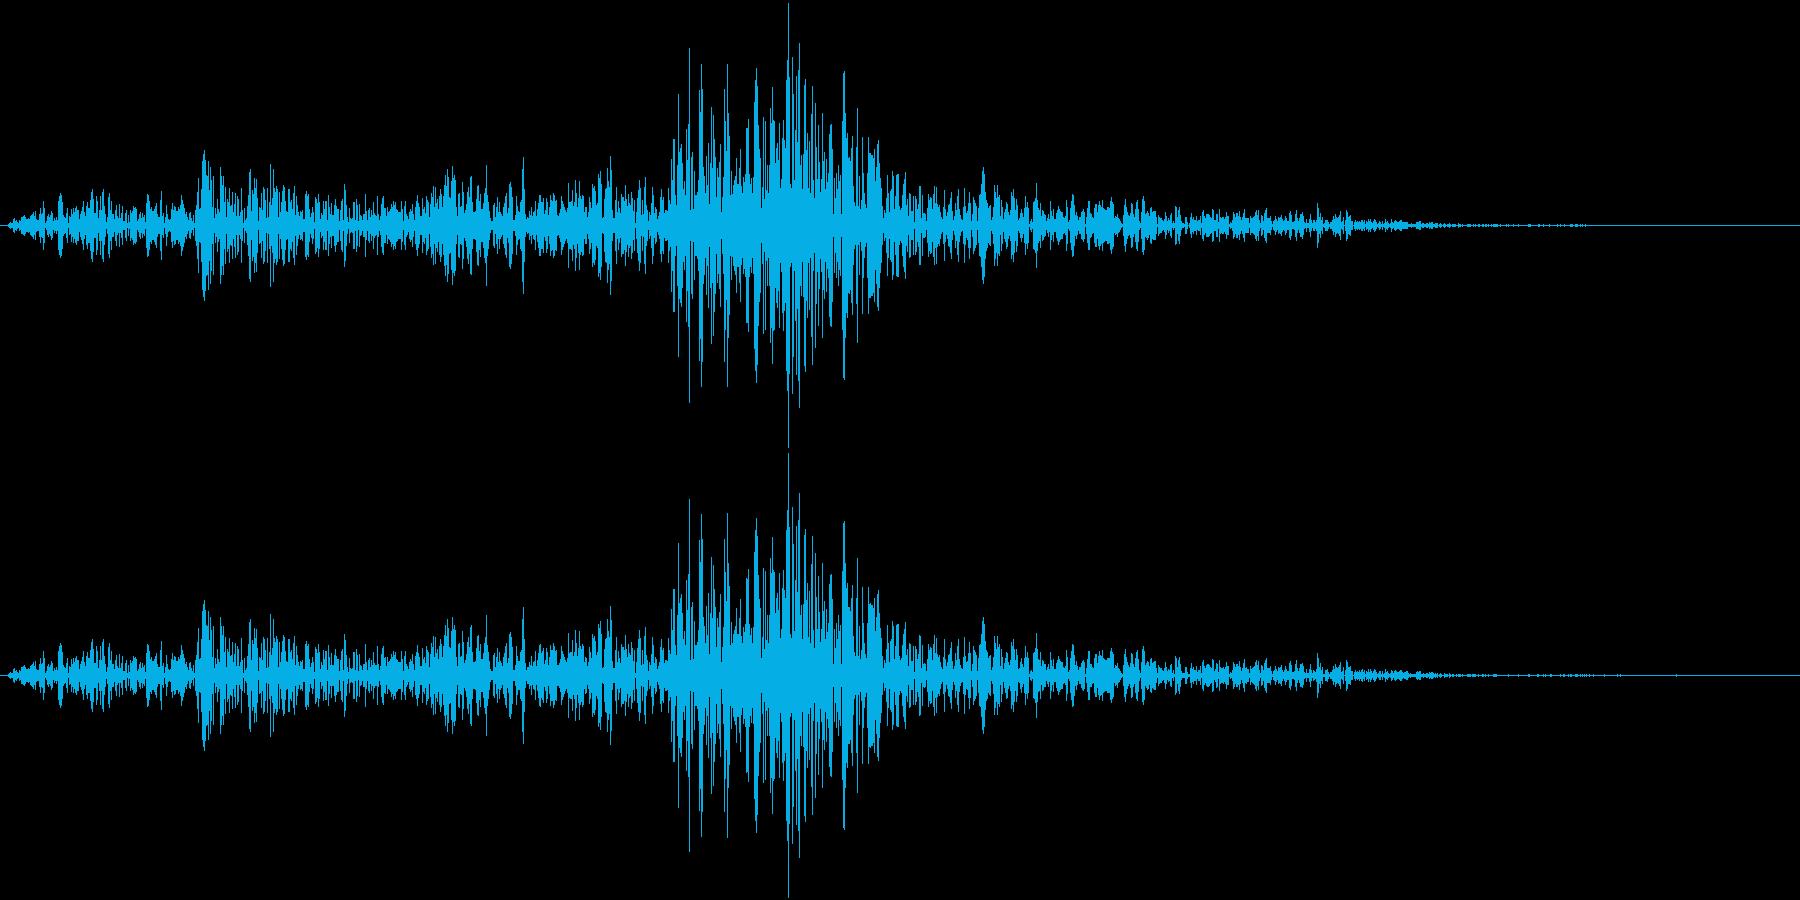 Lighter ライターの音 ジッ 2の再生済みの波形